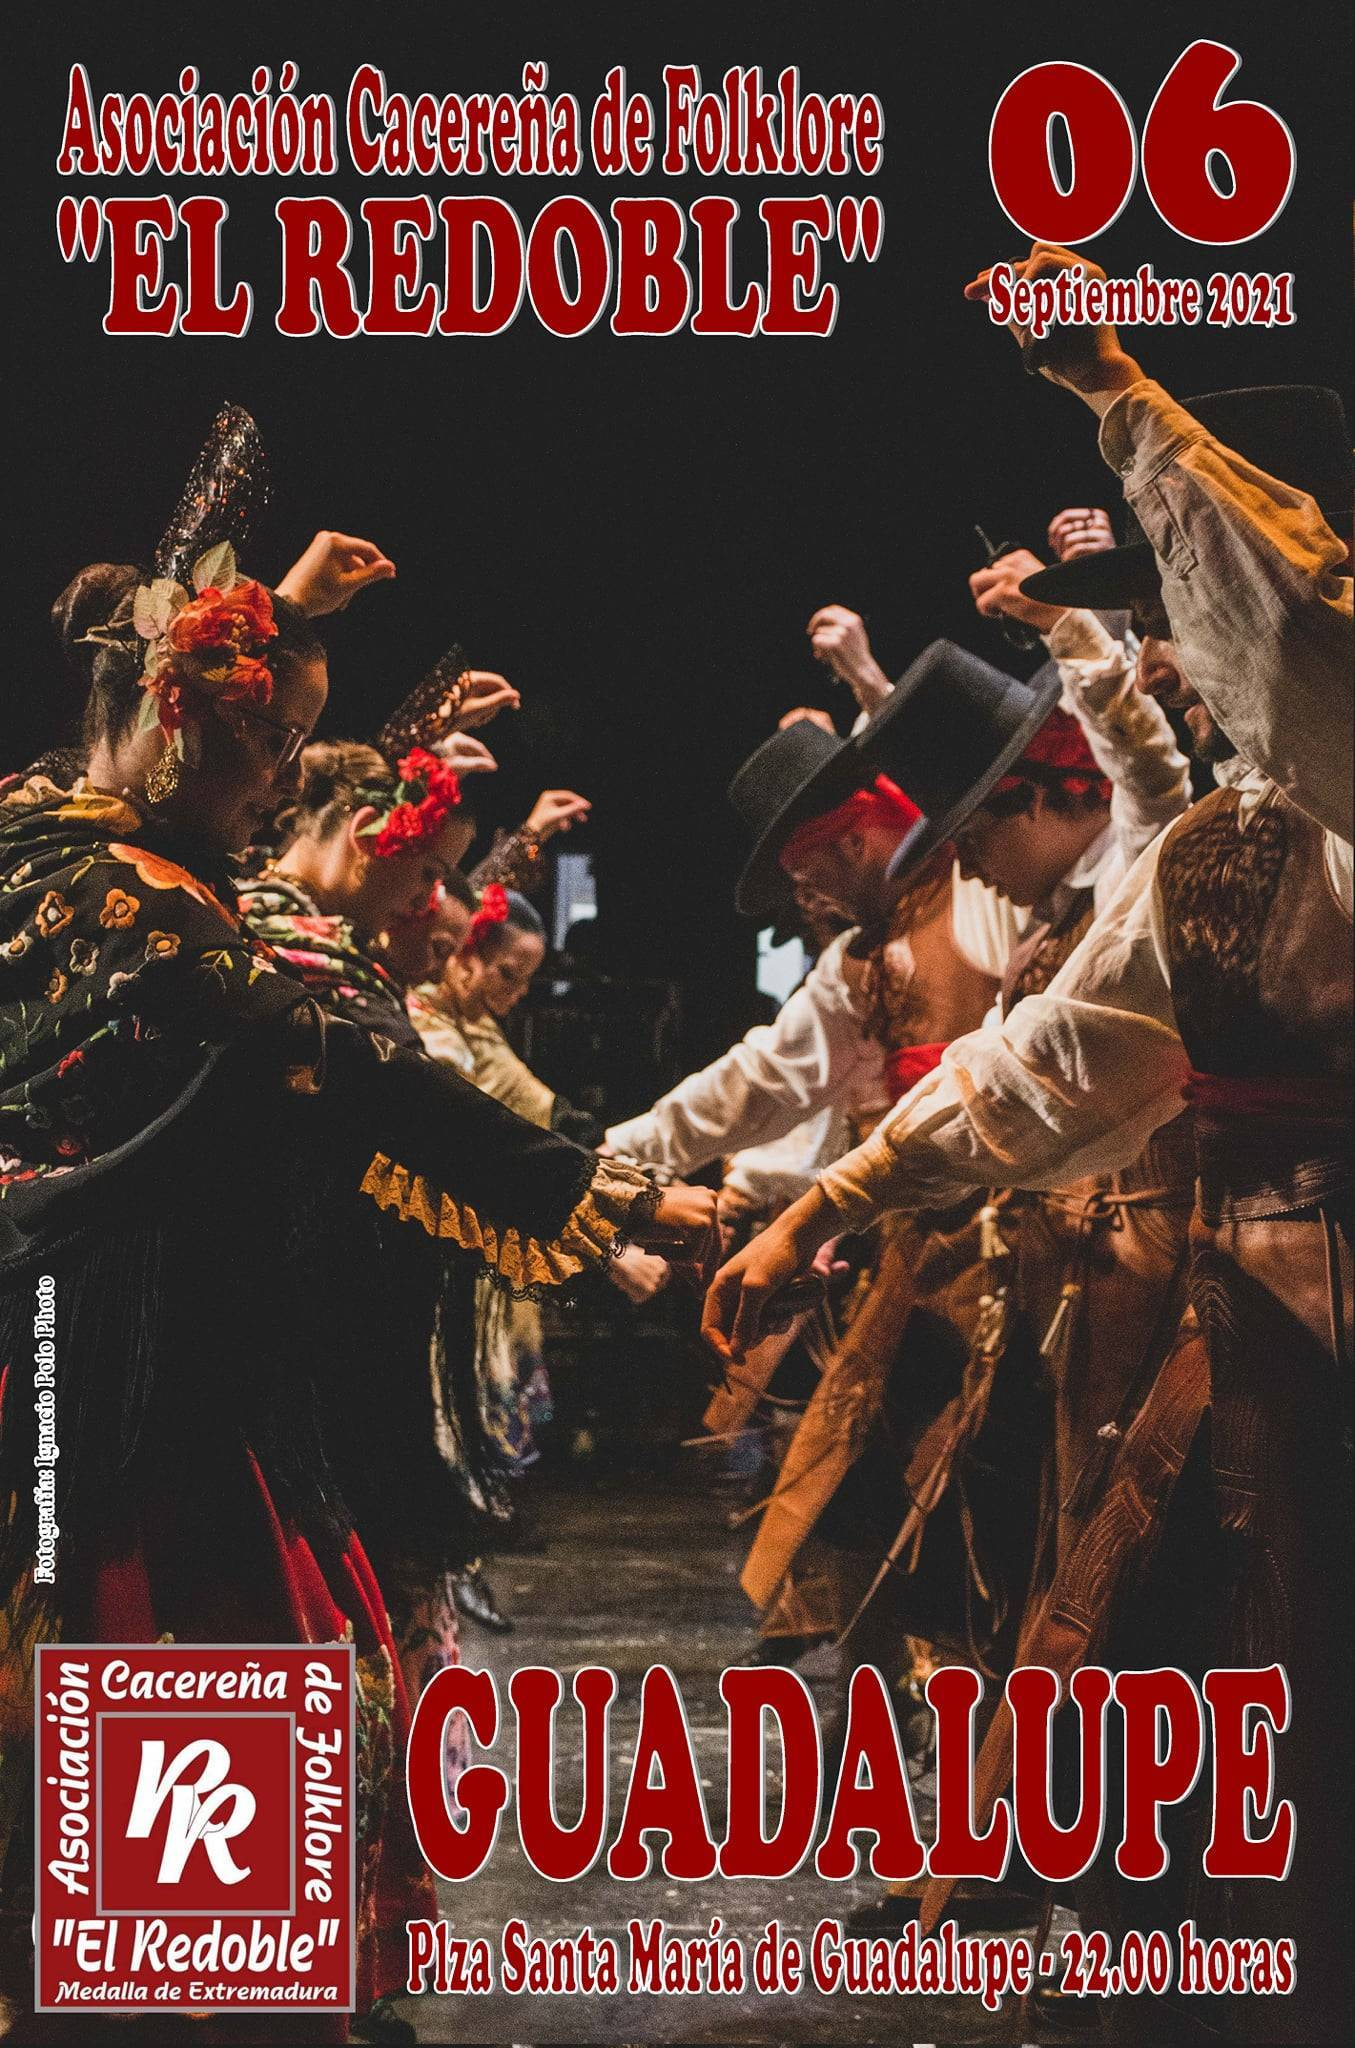 Asociación Cacereña de Folklore 'El Redoble' (2021) - Guadalupe (Cáceres)